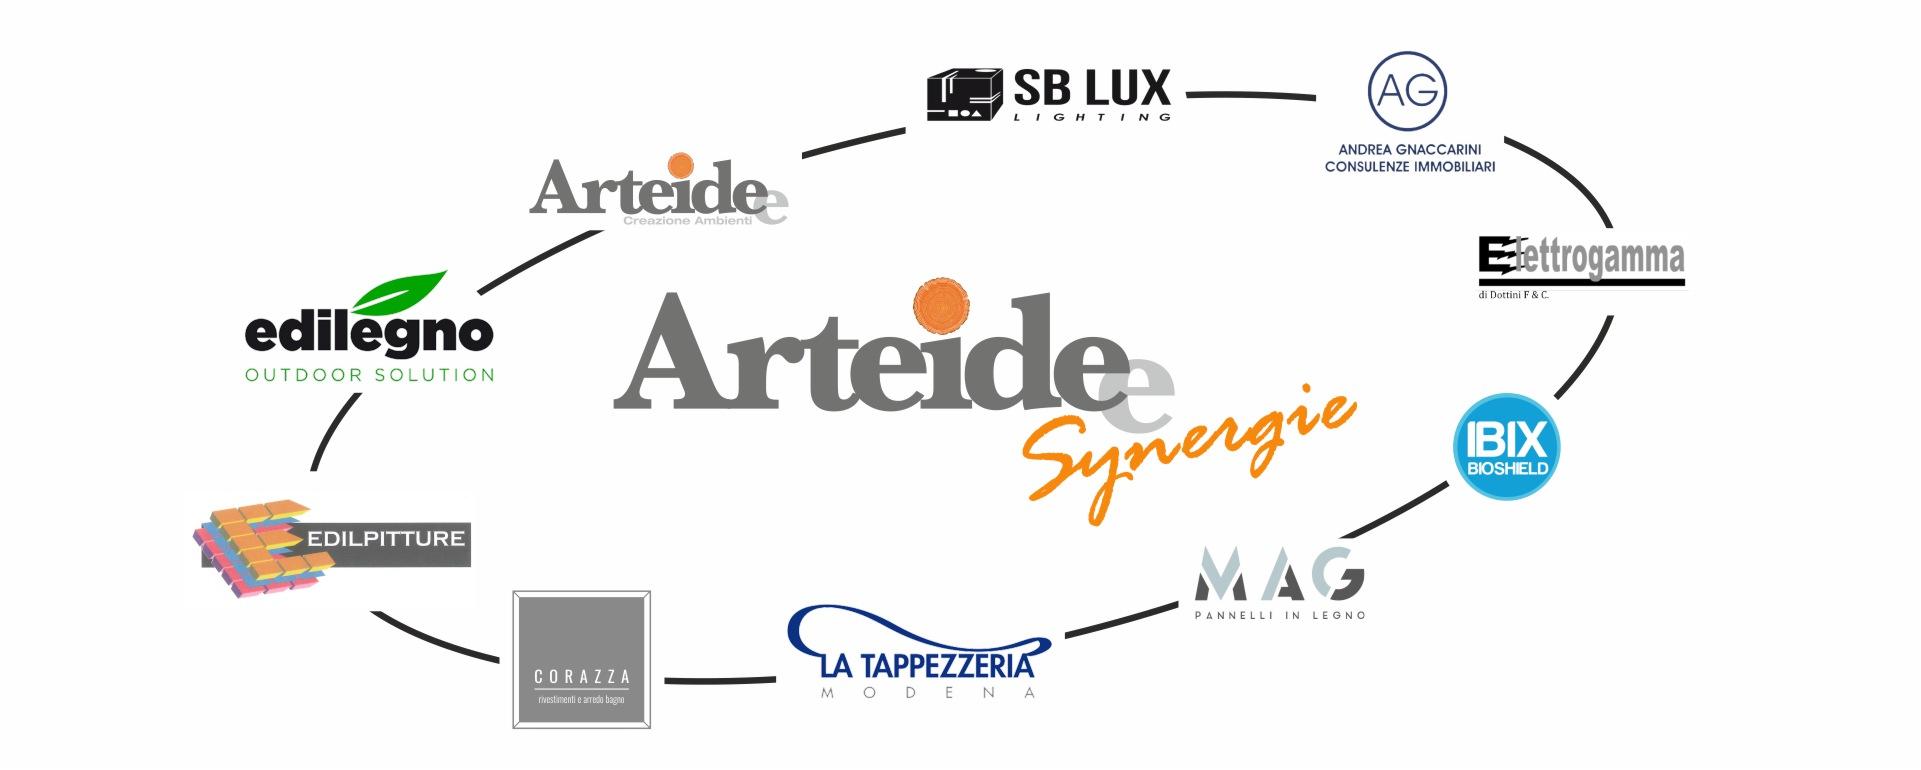 arteide-synergie-2020-ultima